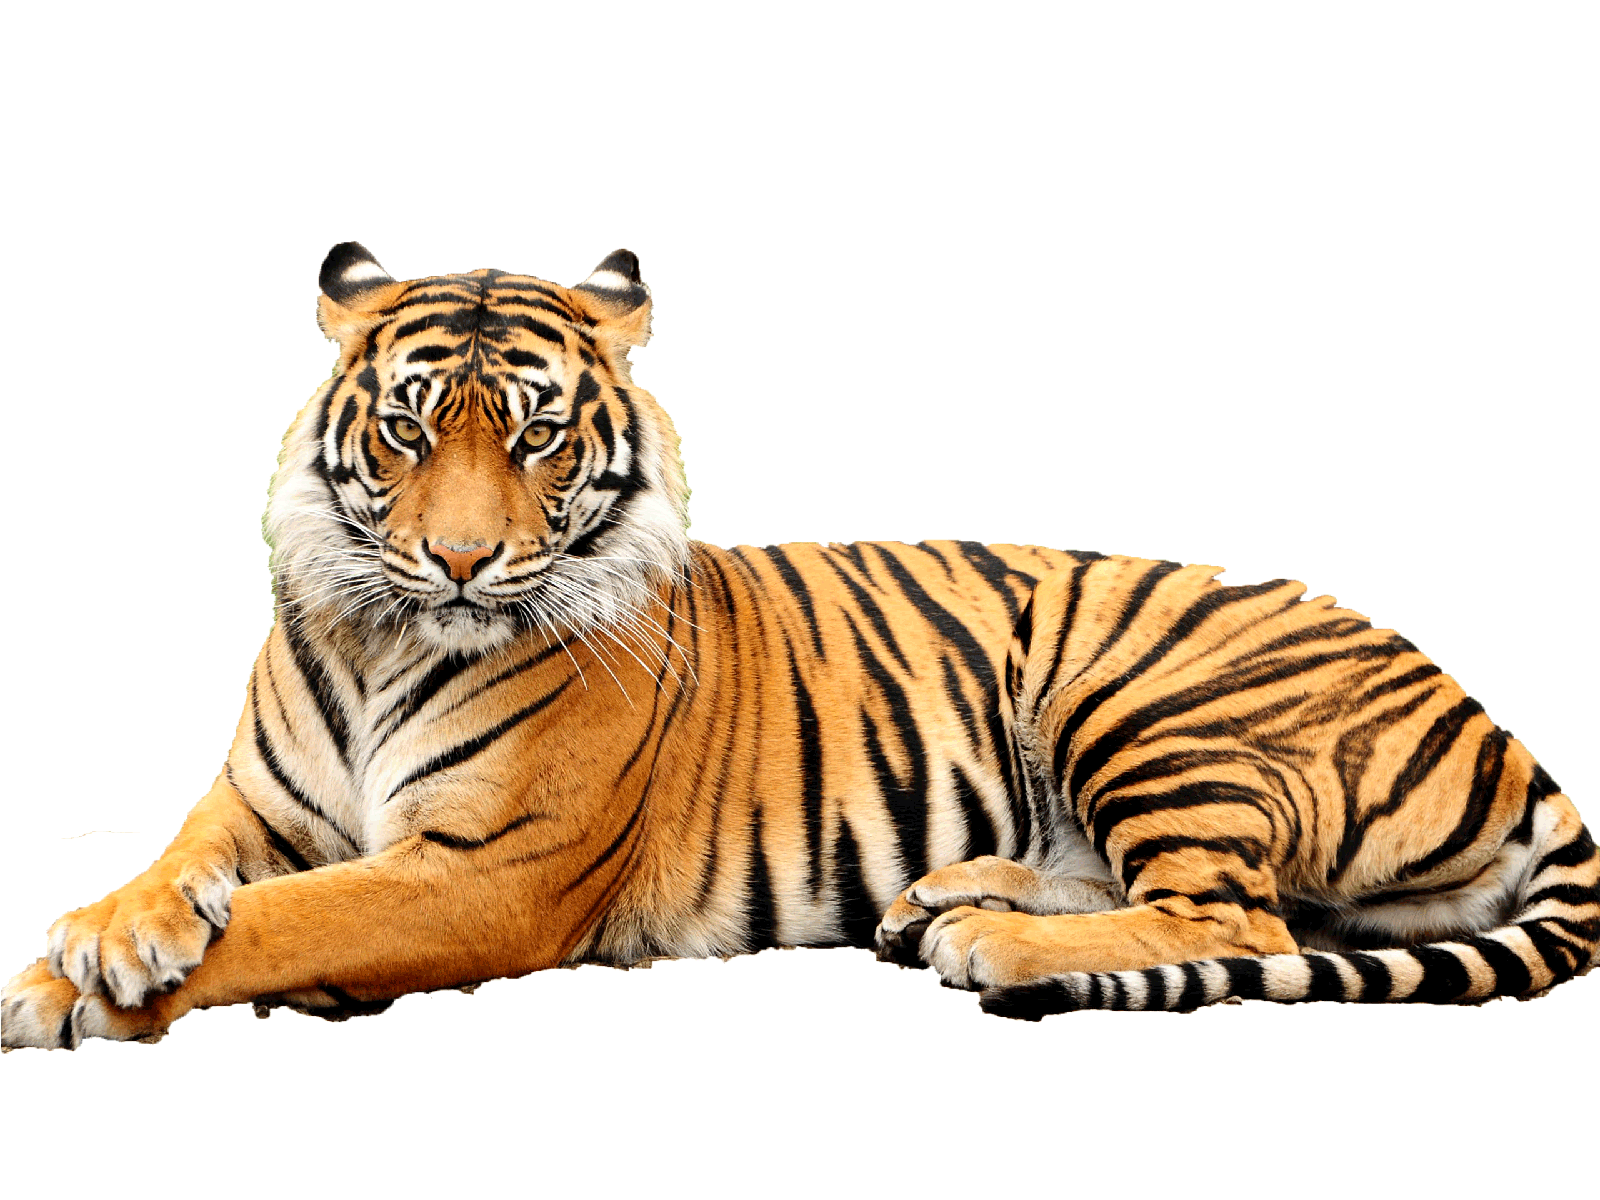 clipart transparent Transparent tiger. Png images free download